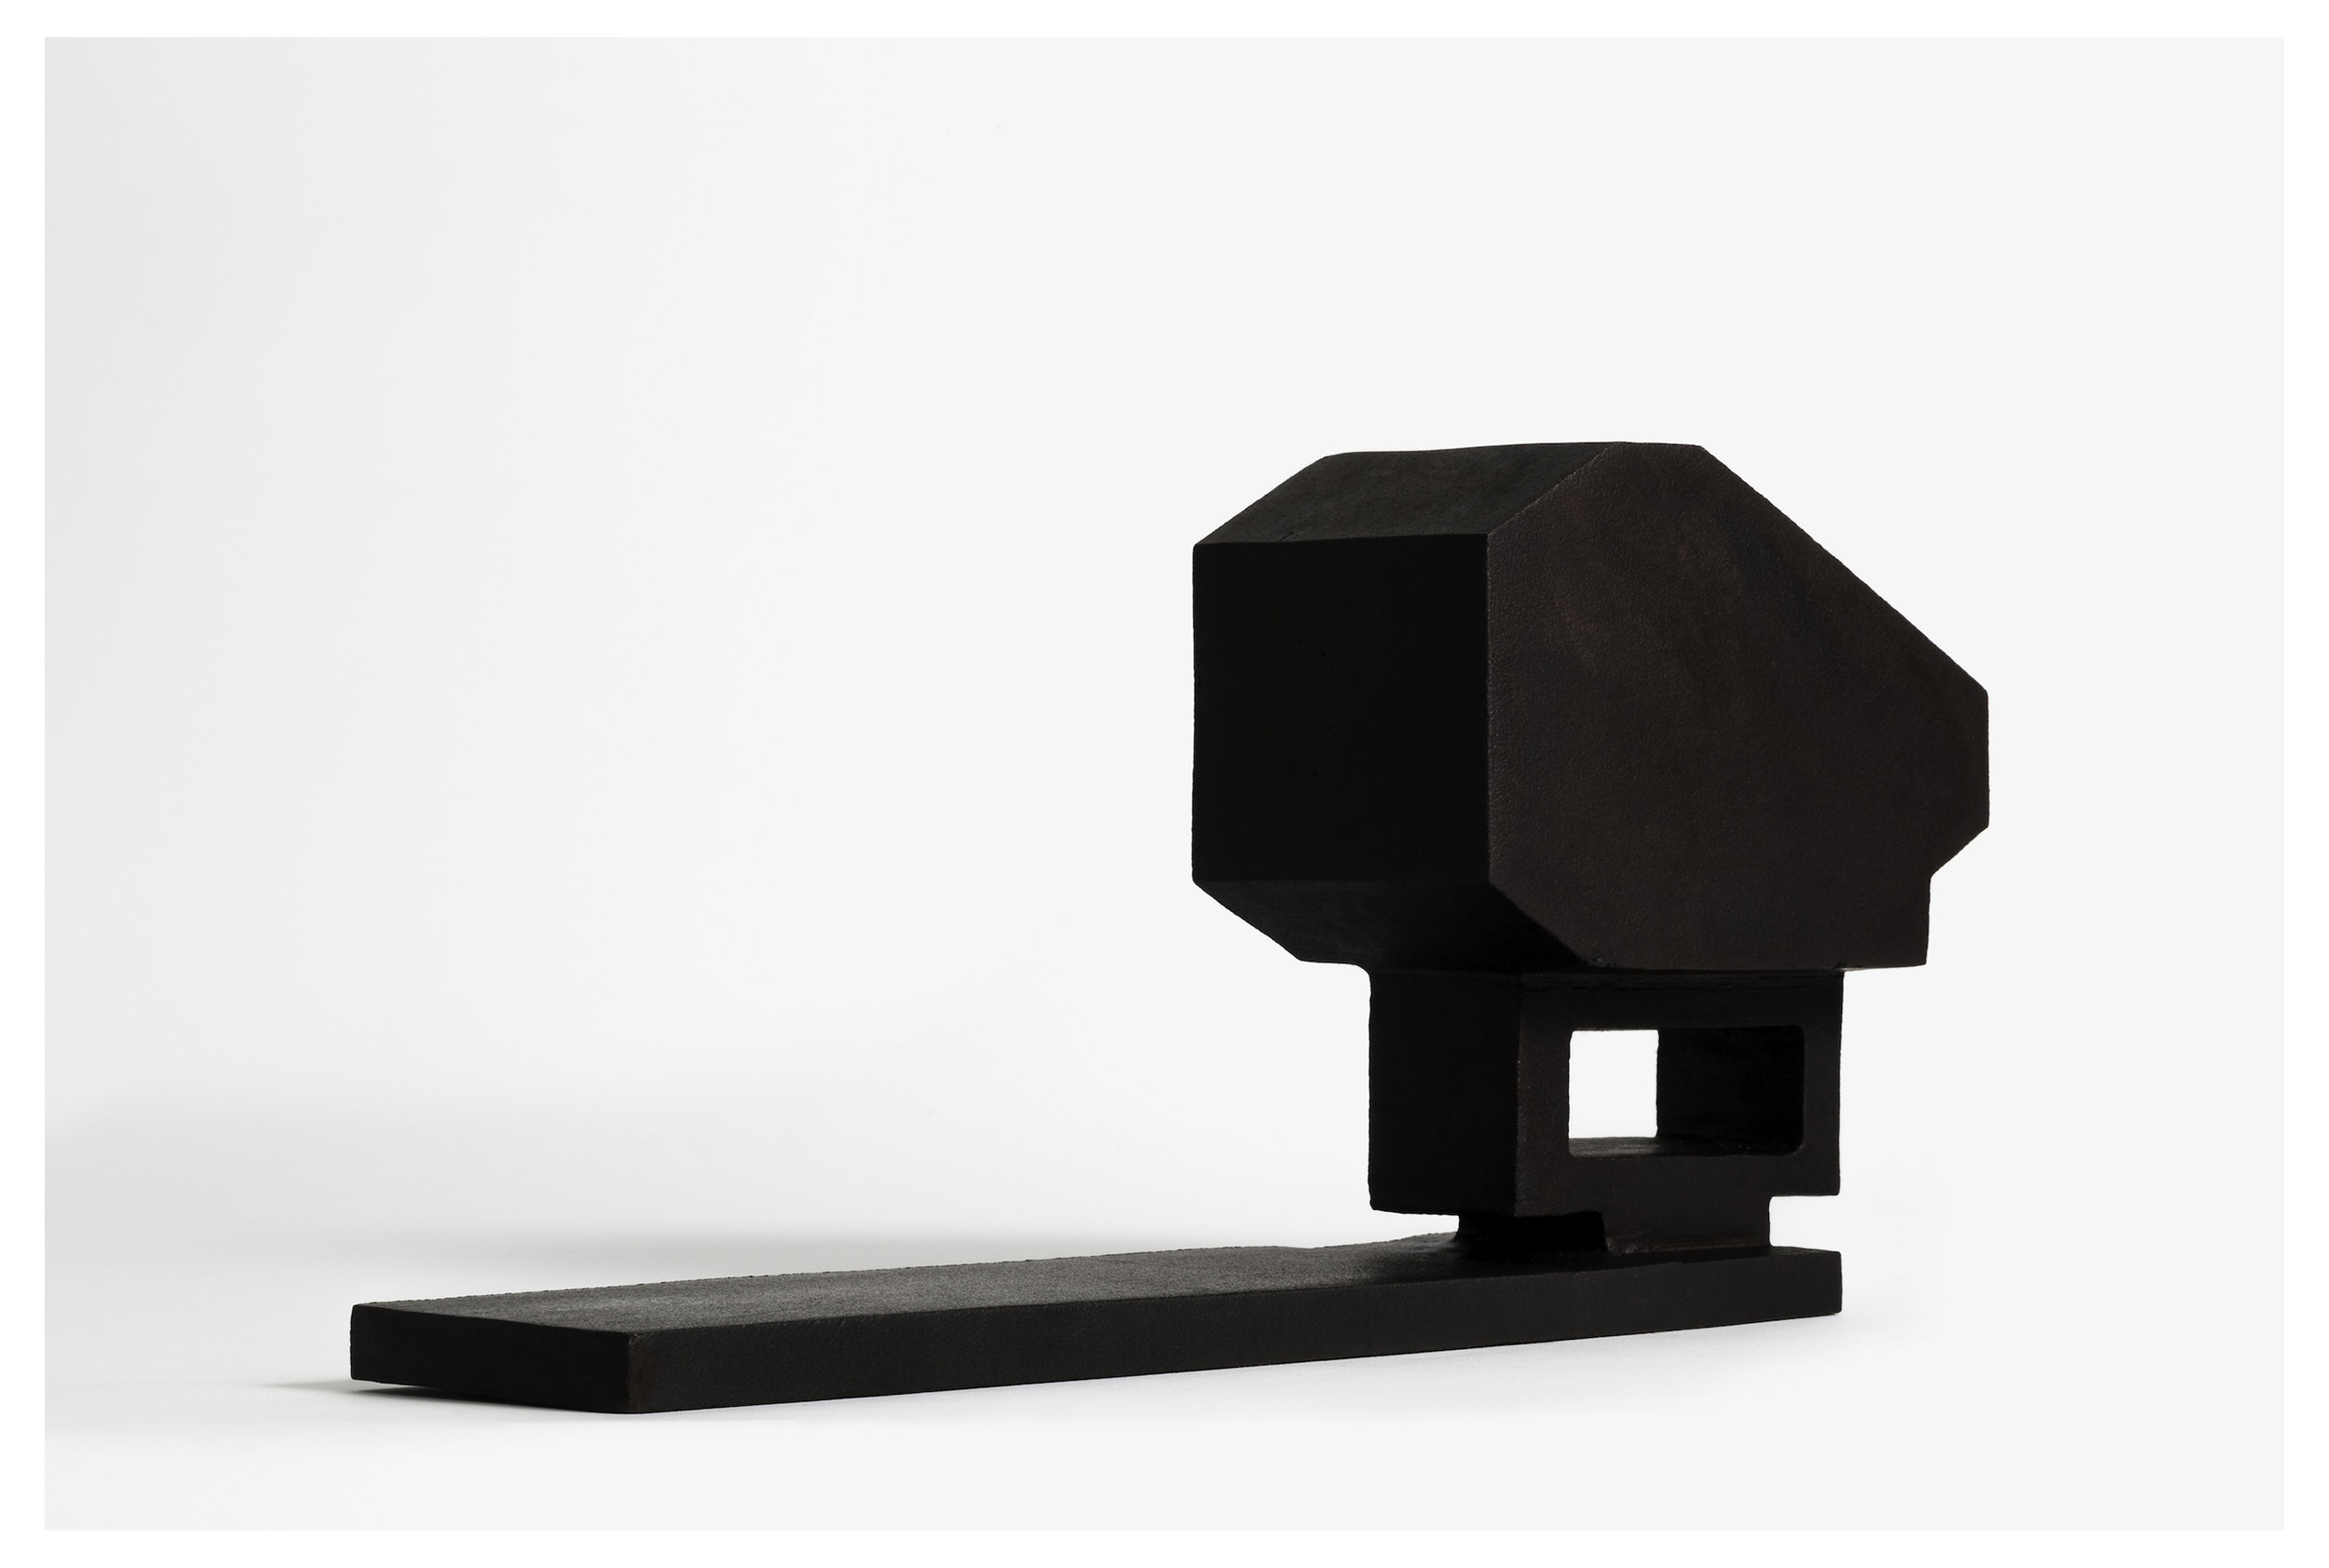 Seher Shah, Untitled (bridge), 2015, cast iron, 18.4 x 10.3 x 38 cm, Ed of 2. Courtesy of Artist and Green Art Gallery, Dubai